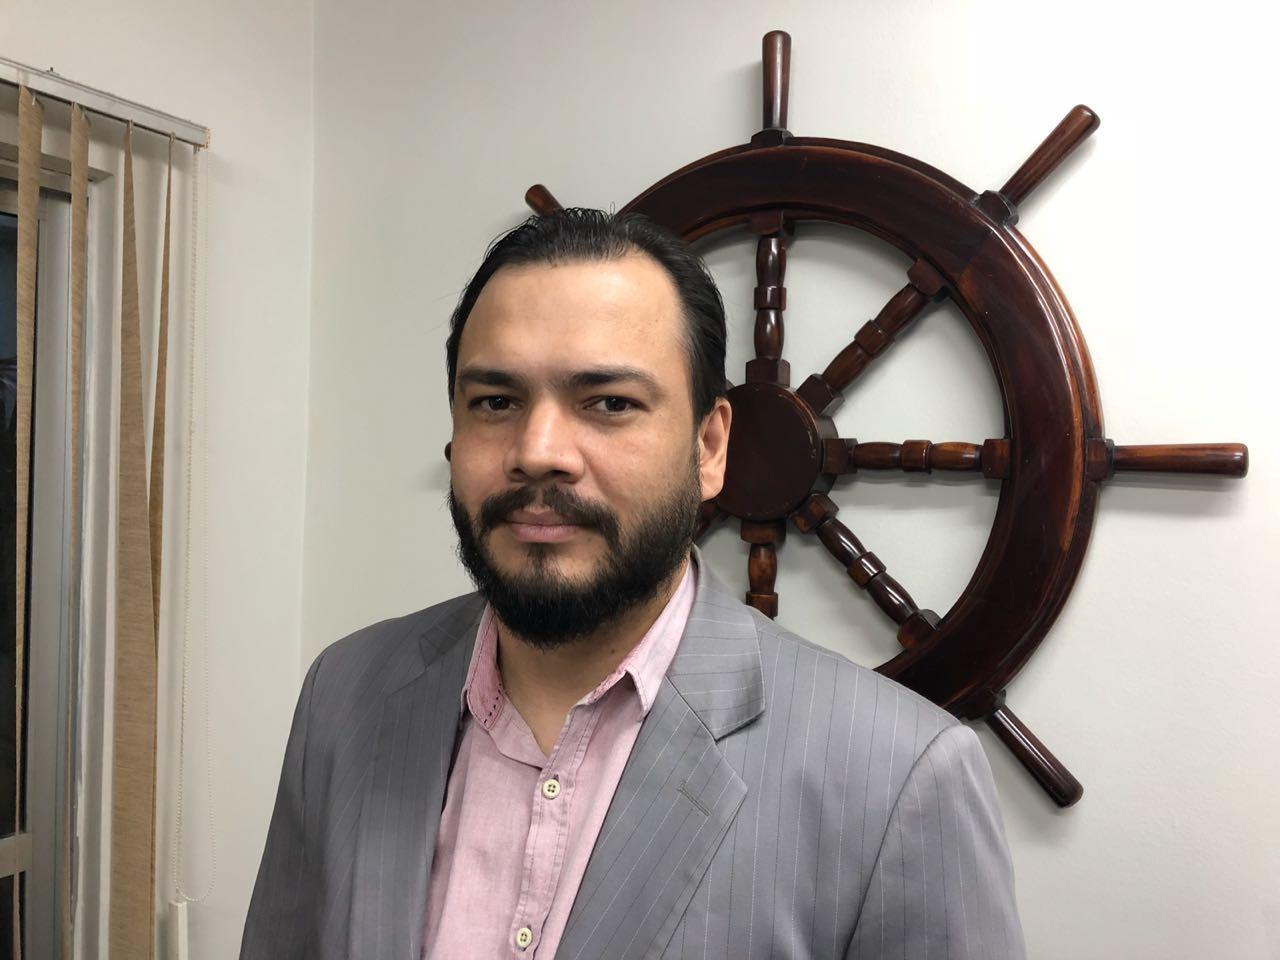 José Adécio Filho